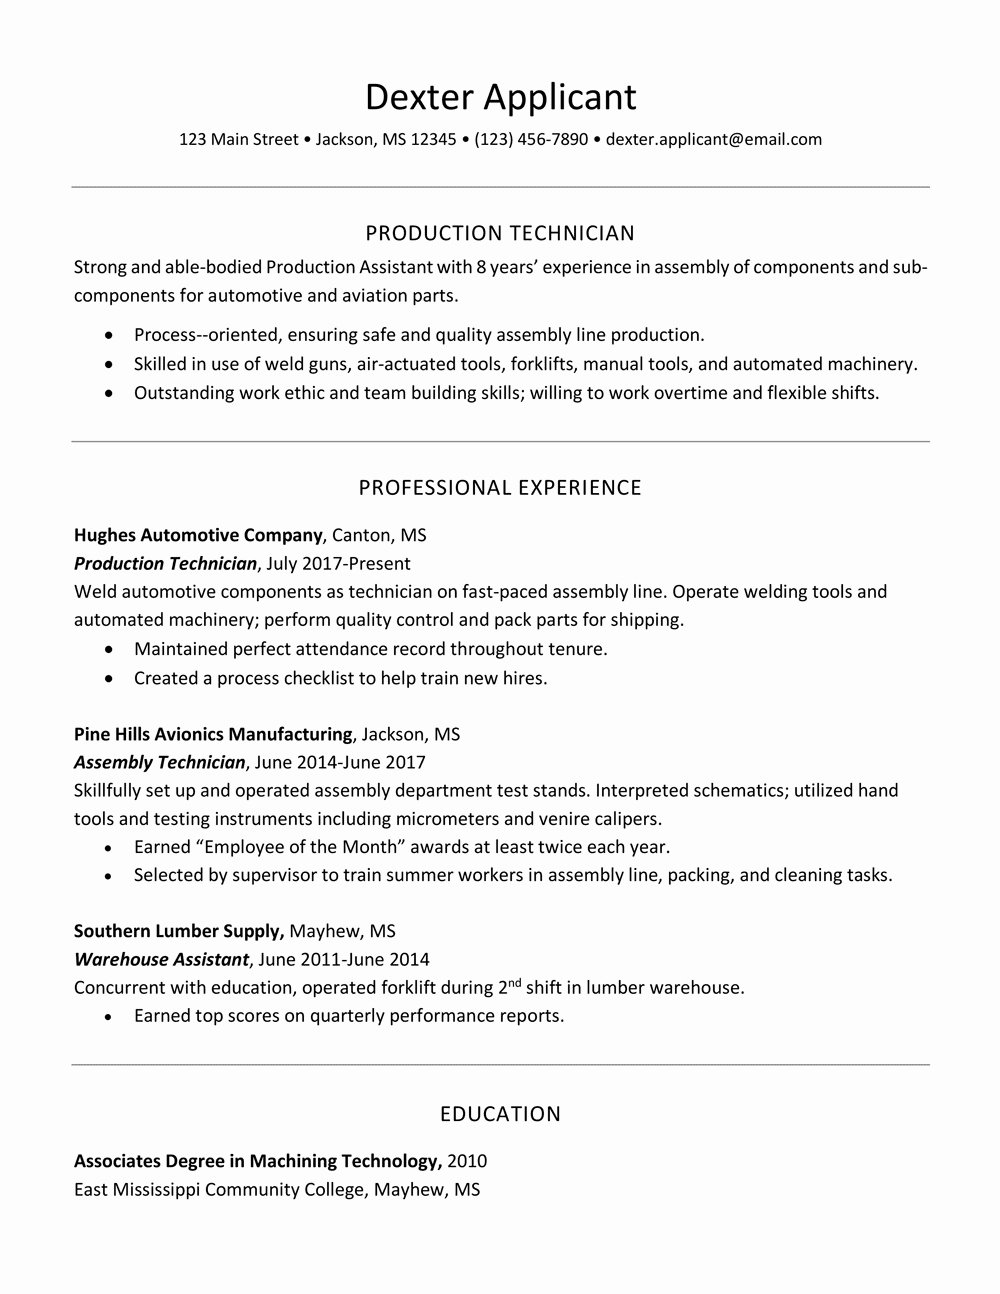 Resume Font Calibri